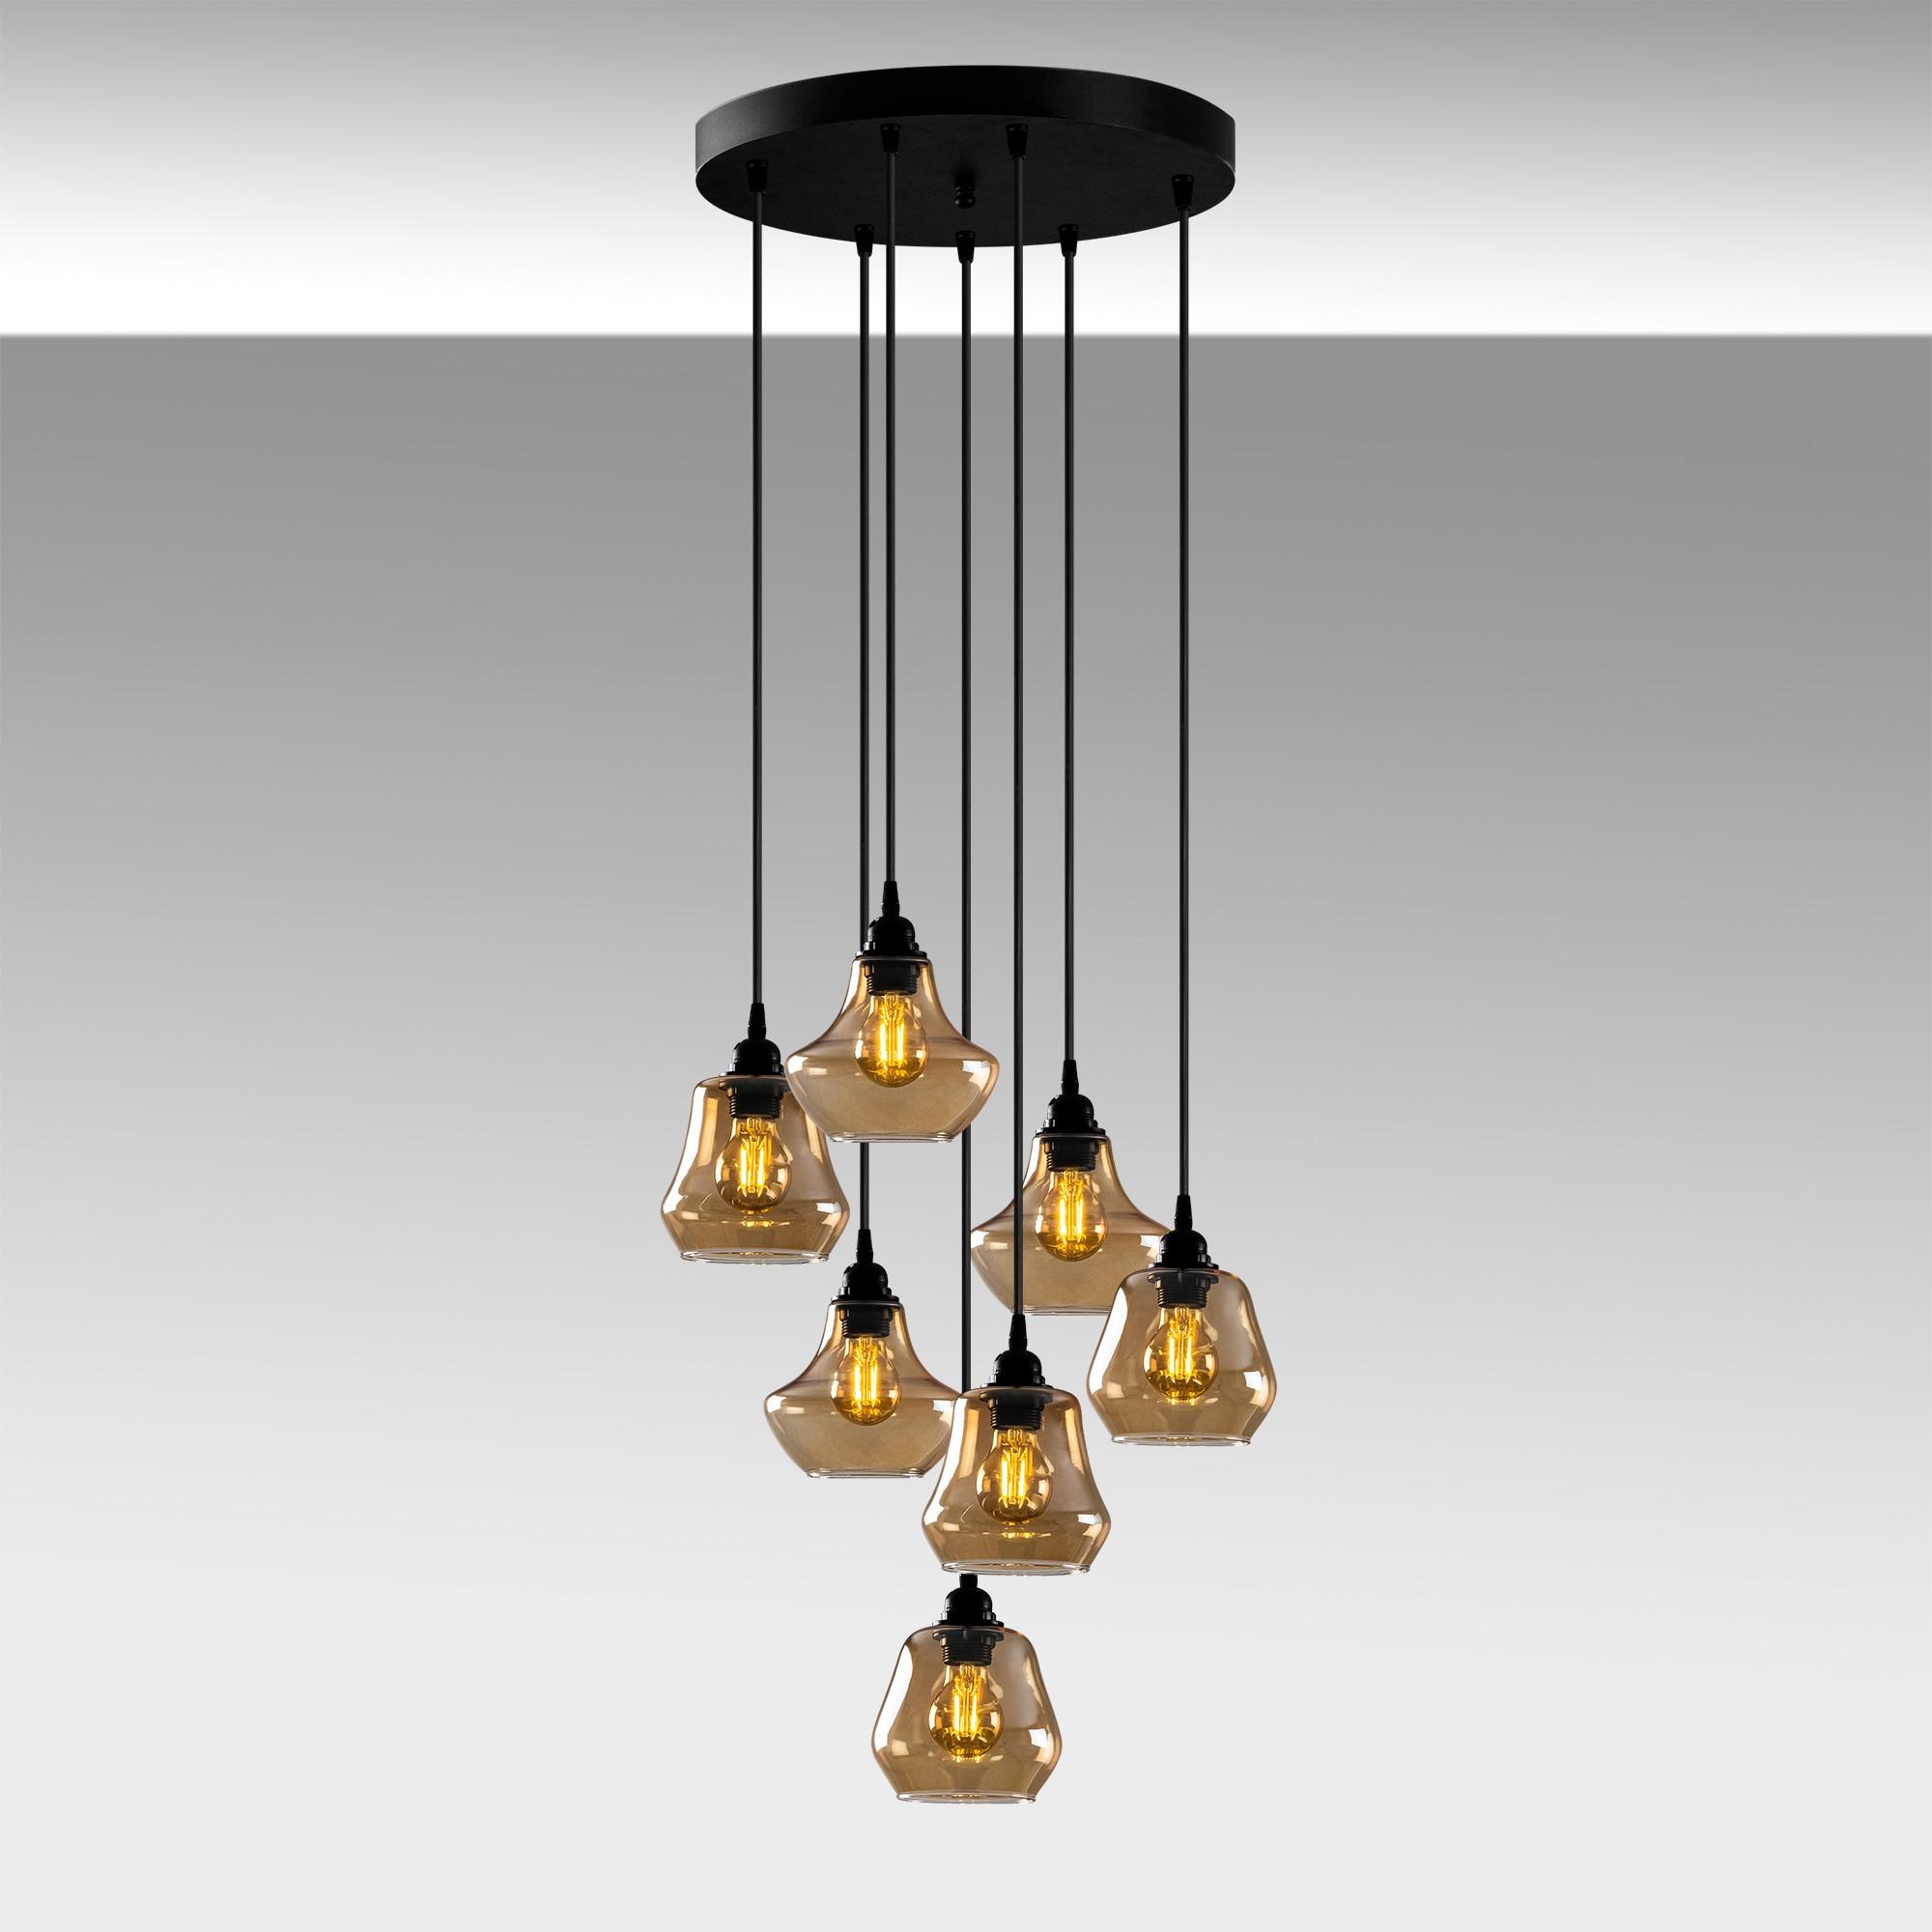 Hanglamp golden glass - goud glas 7 x E27 fitting - sfeerfoto